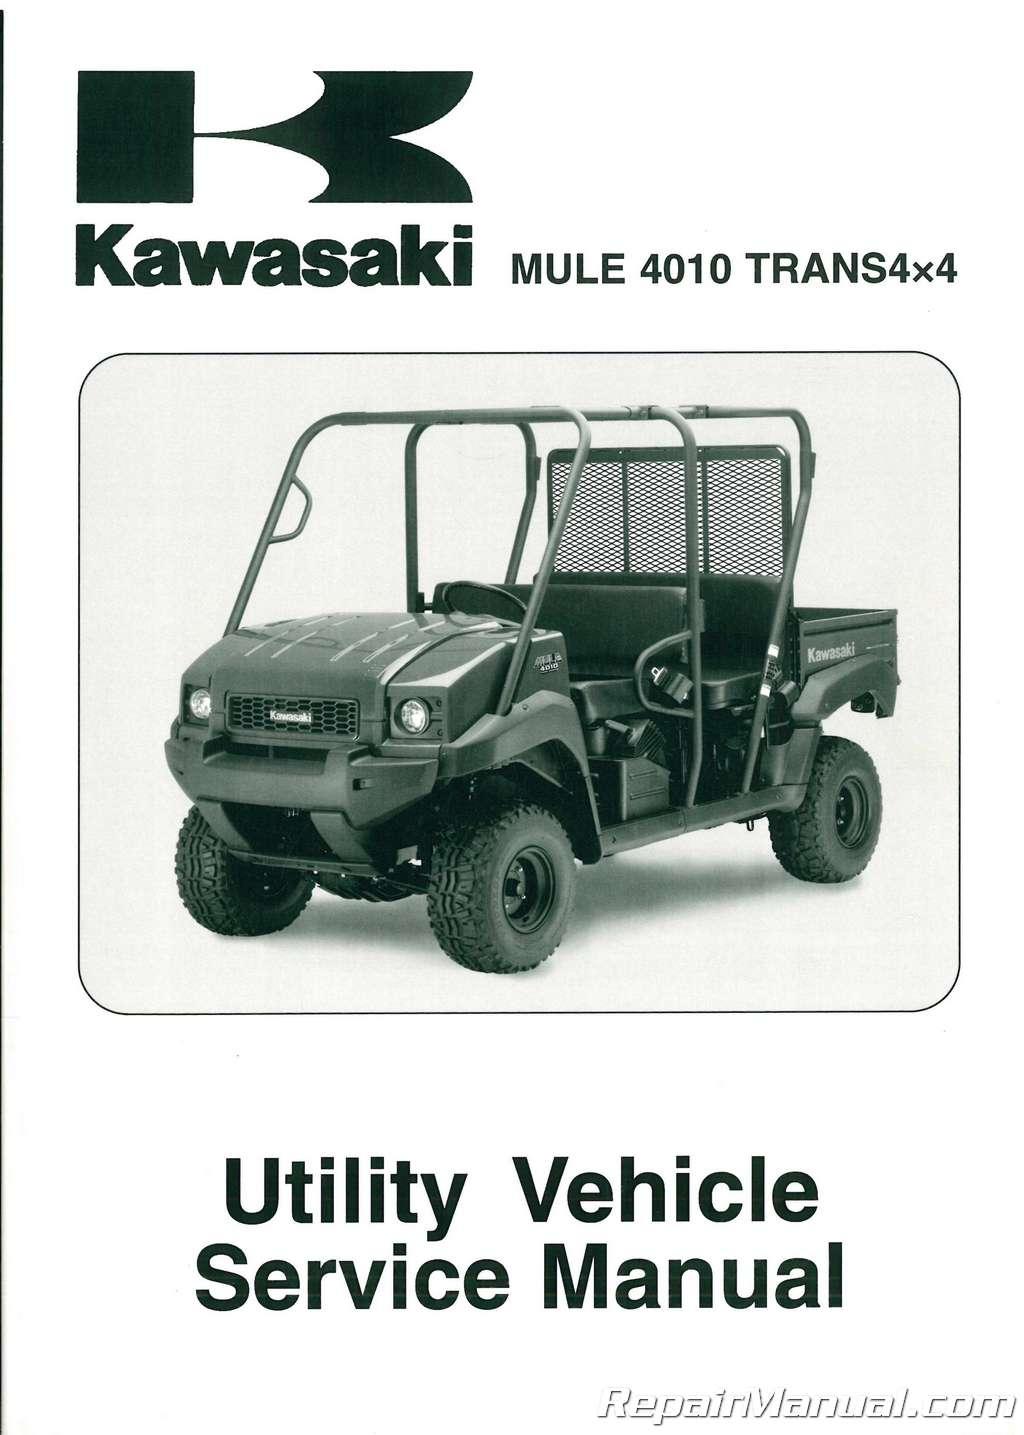 2009-2010-Kawasaki-KAF620R-S-Mule-4010-Trans4x4- ...